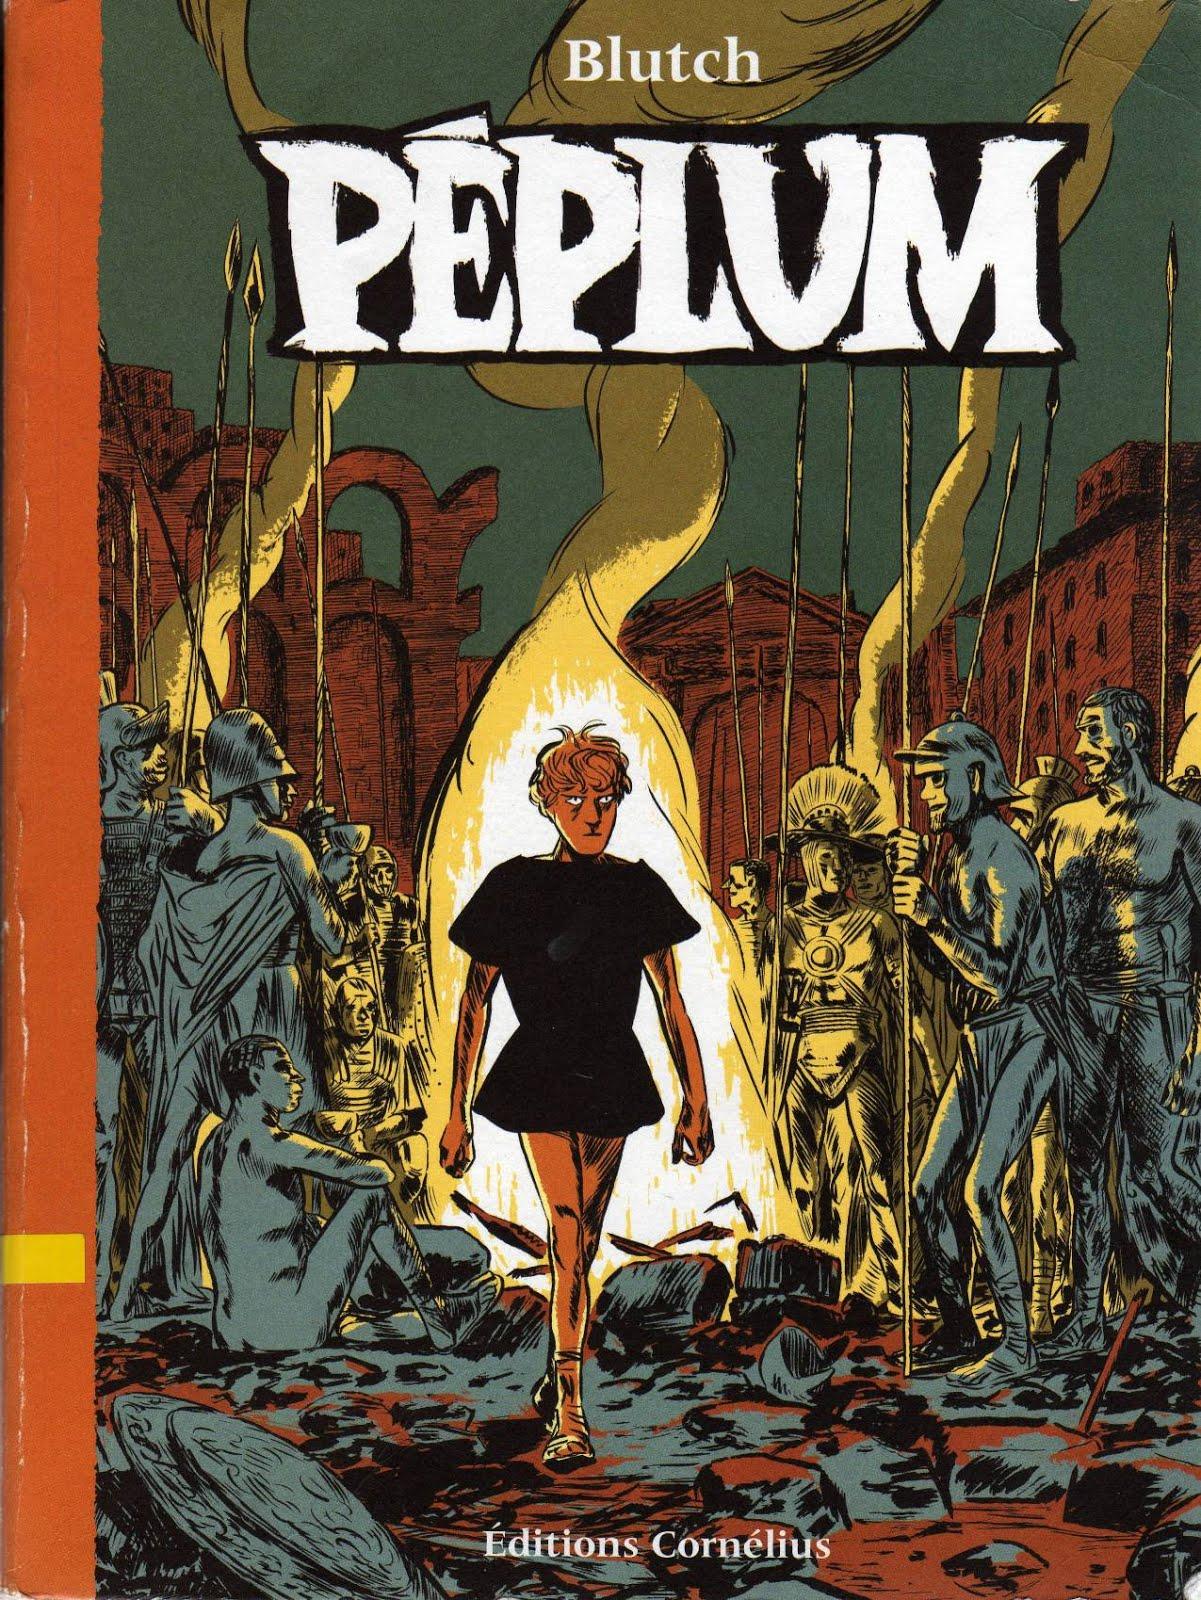 Péplum - Blutch. Ed. Cornélius